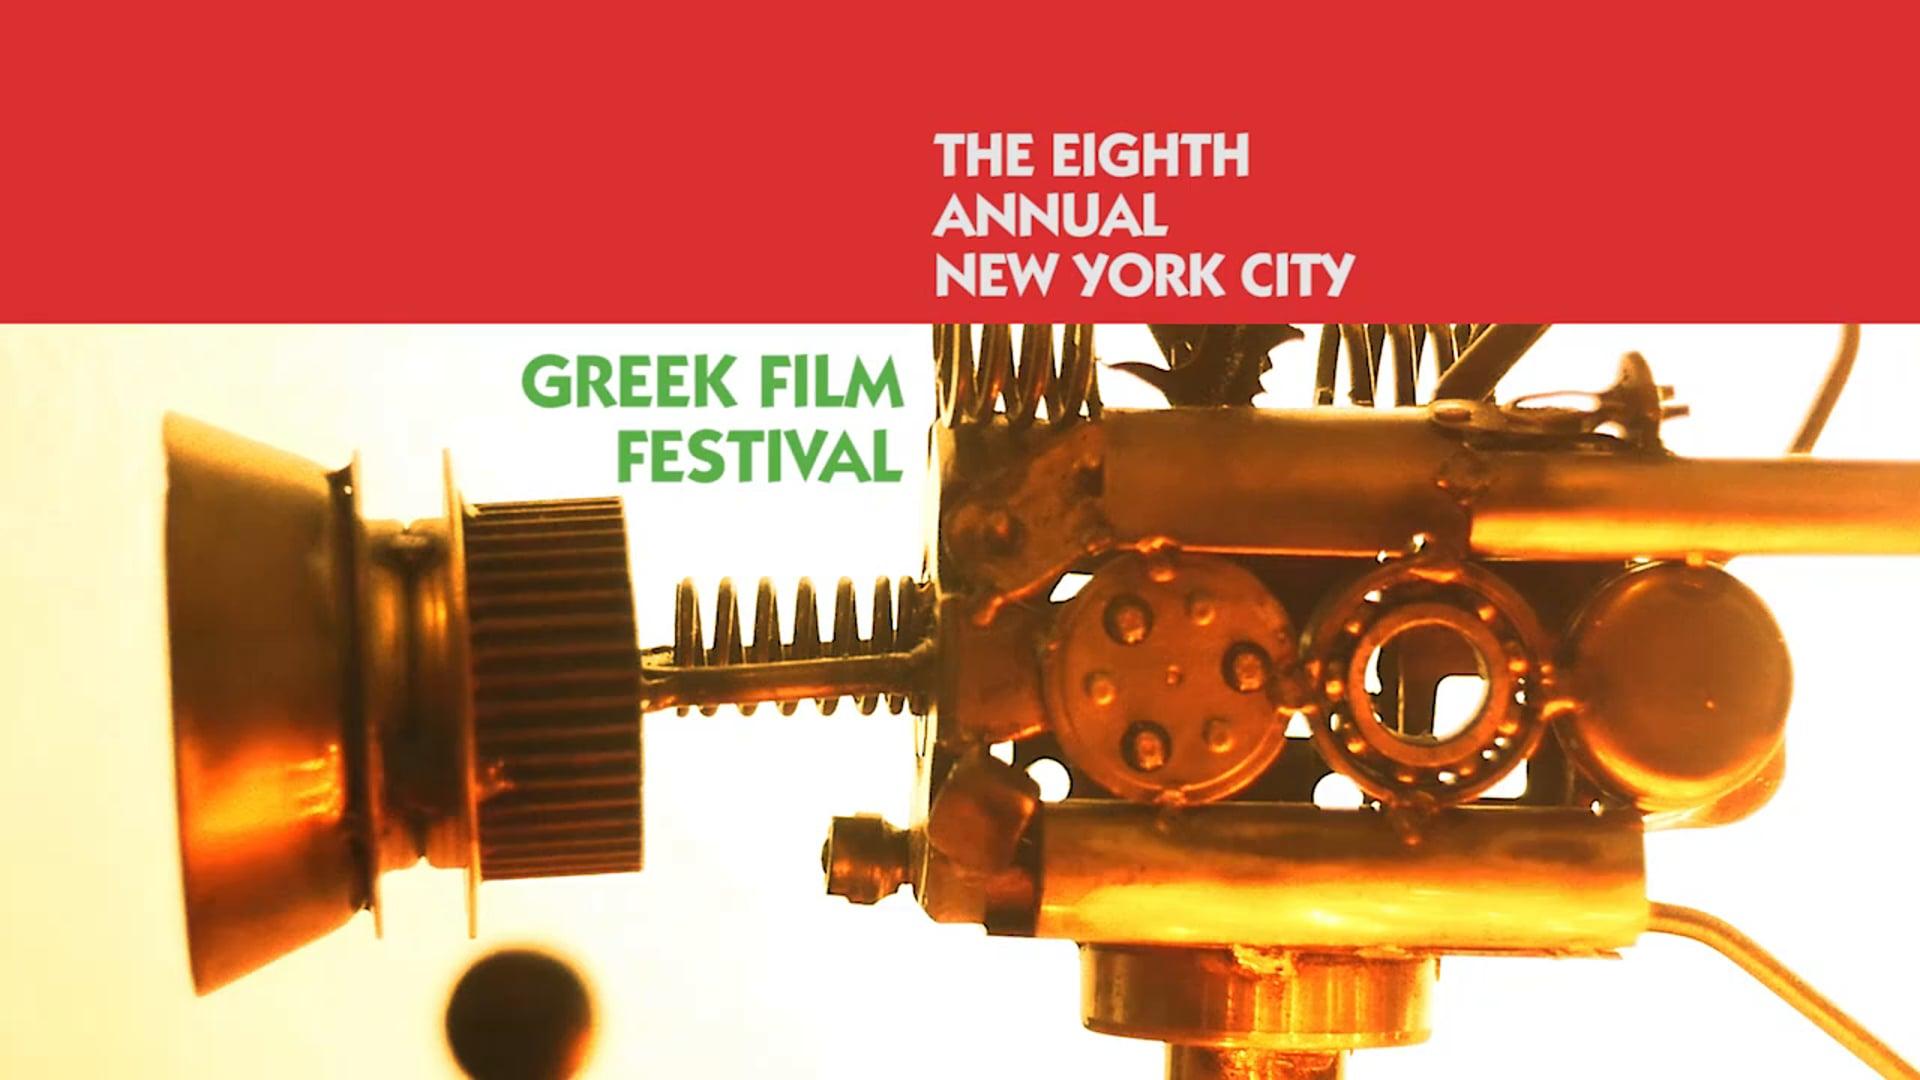 The NYC Greek Film Festival 2014